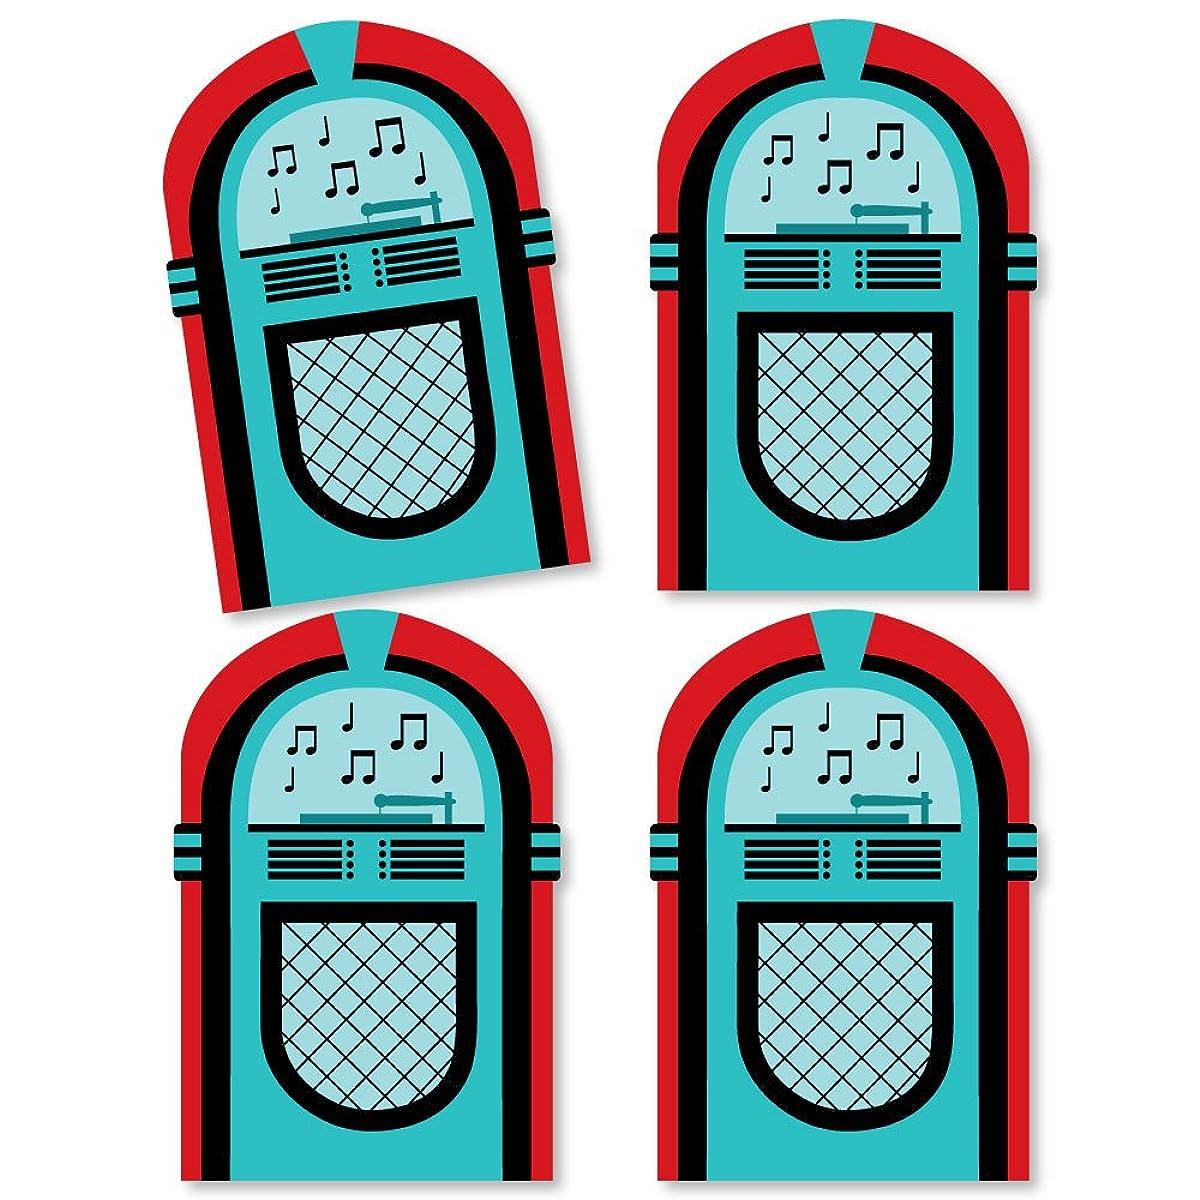 50's Sock Hop - Jukebox Decorations DIY 1950s Rock N Roll Party Essentials - Set of 20